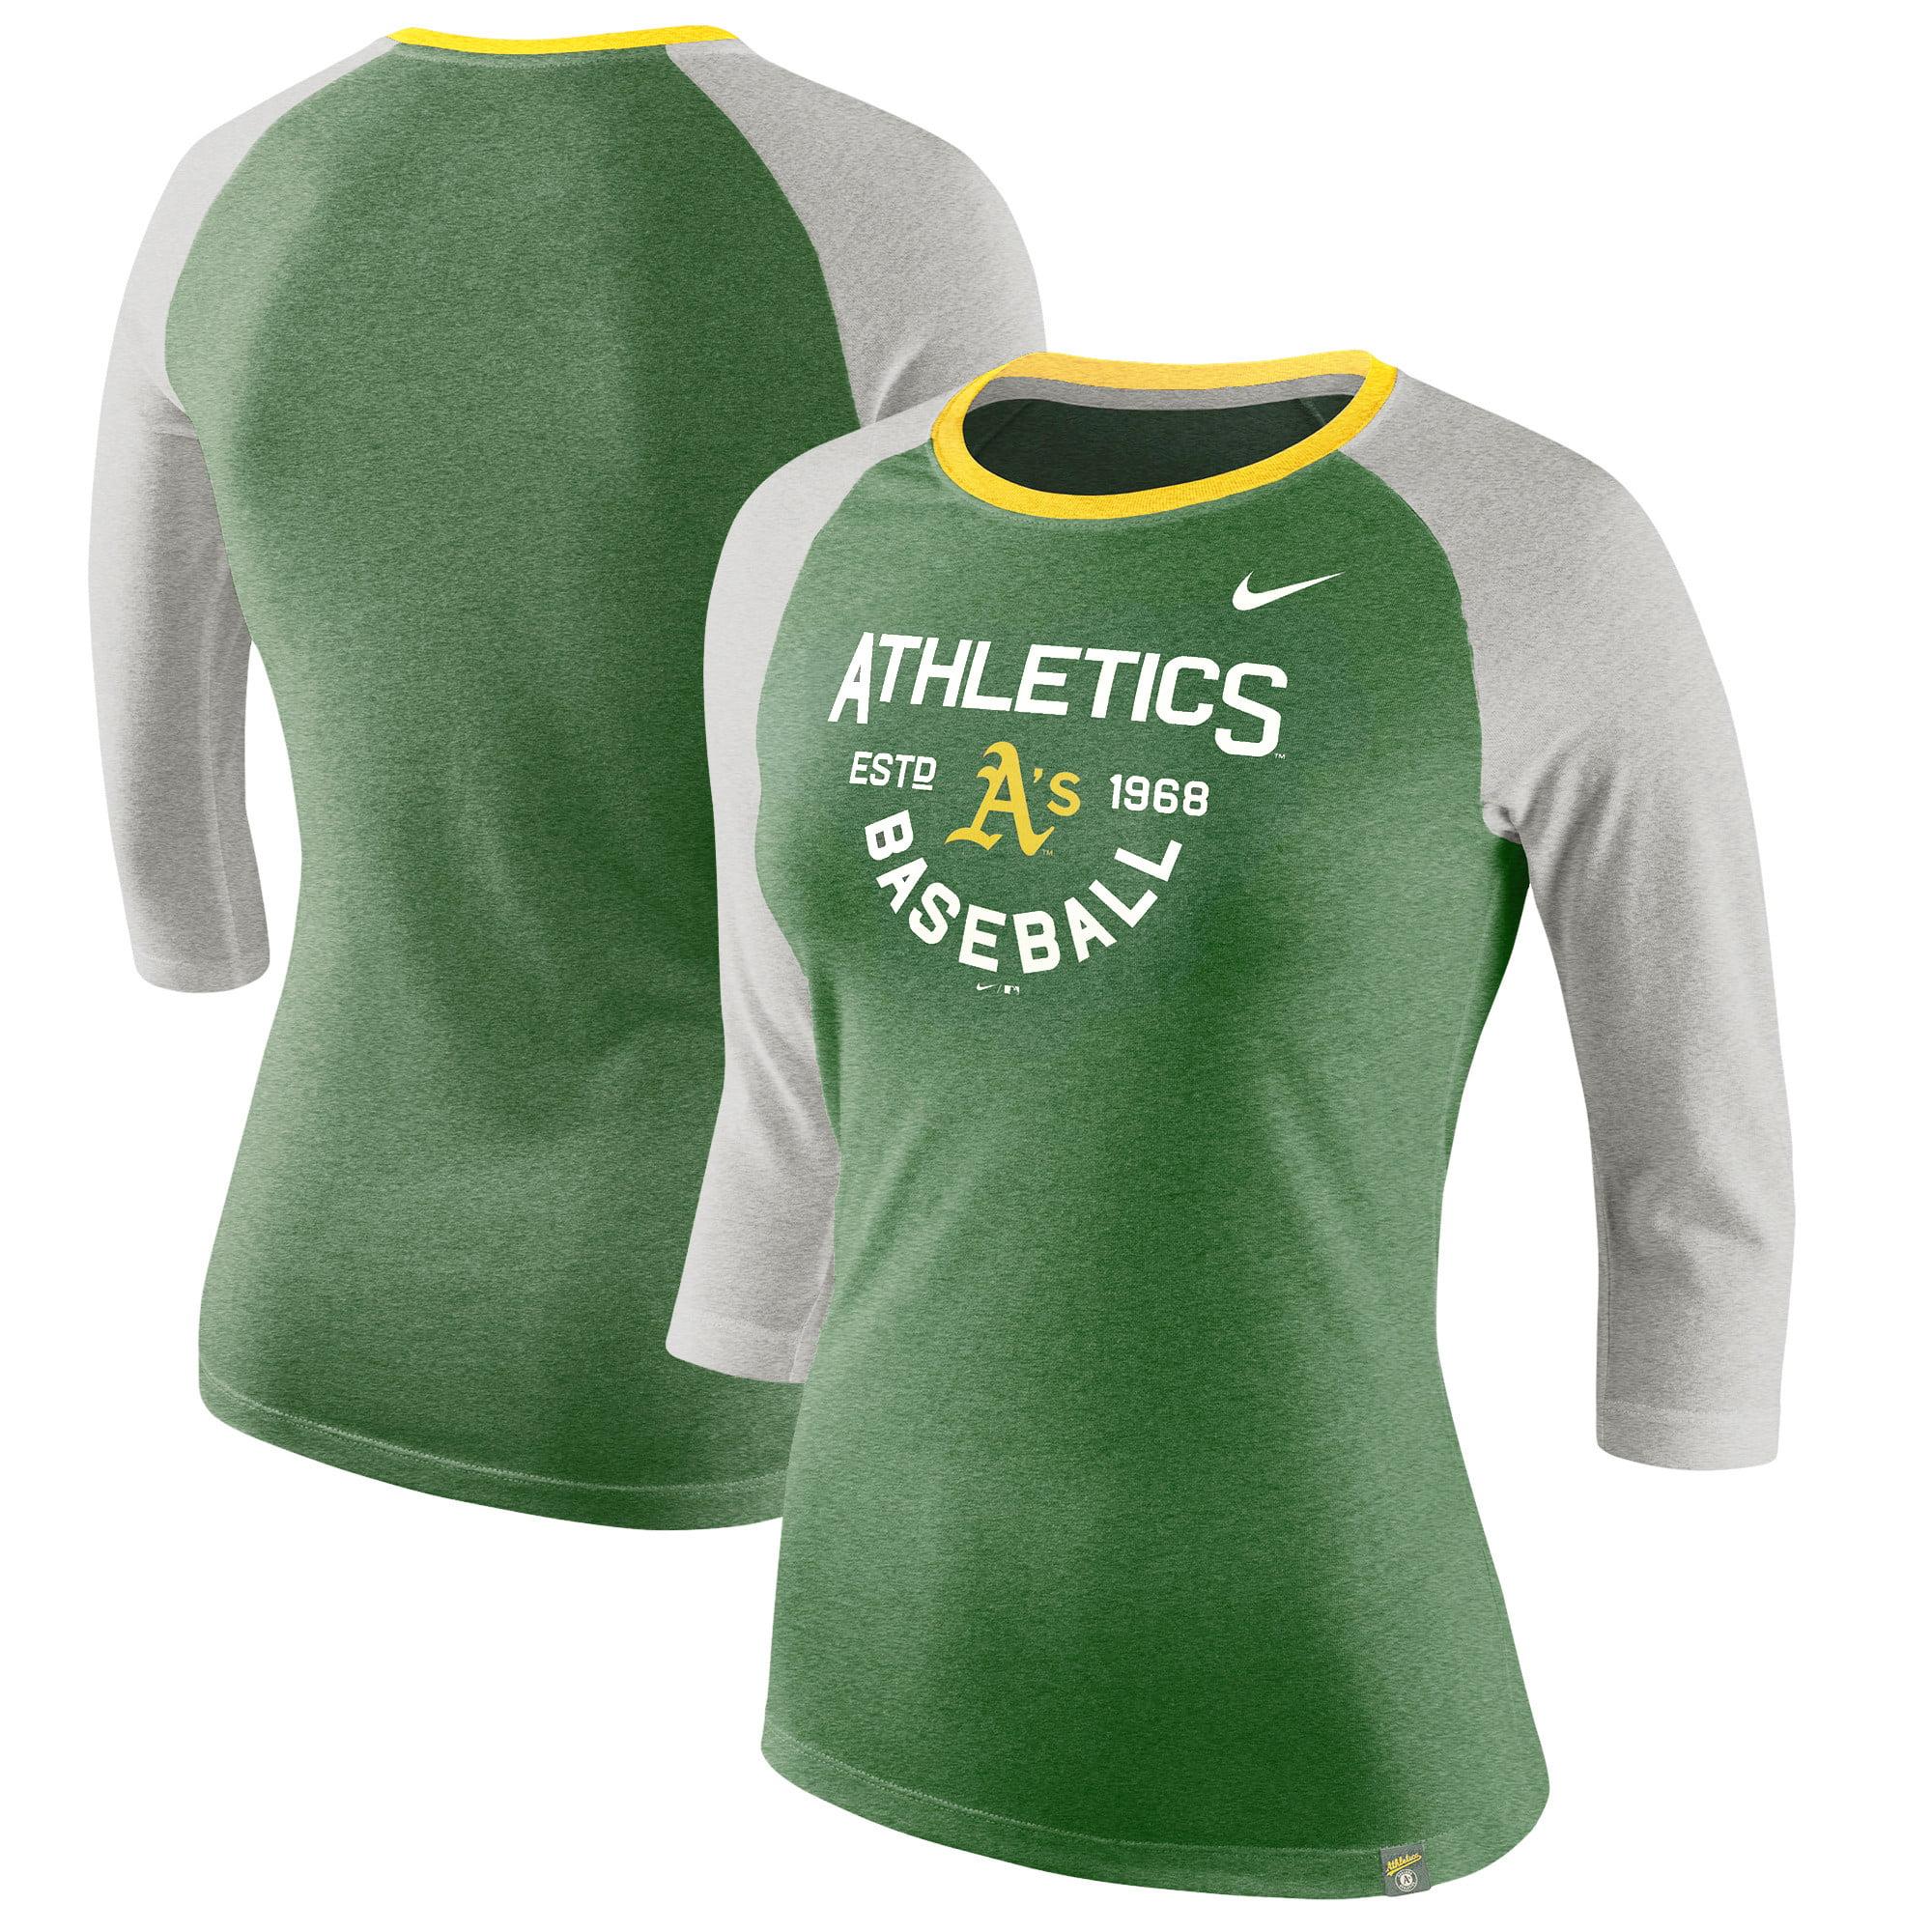 Oakland Athletics Nike Women's Tri-Blend Raglan 3/4-Sleeve T-Shirt - Heathered Green